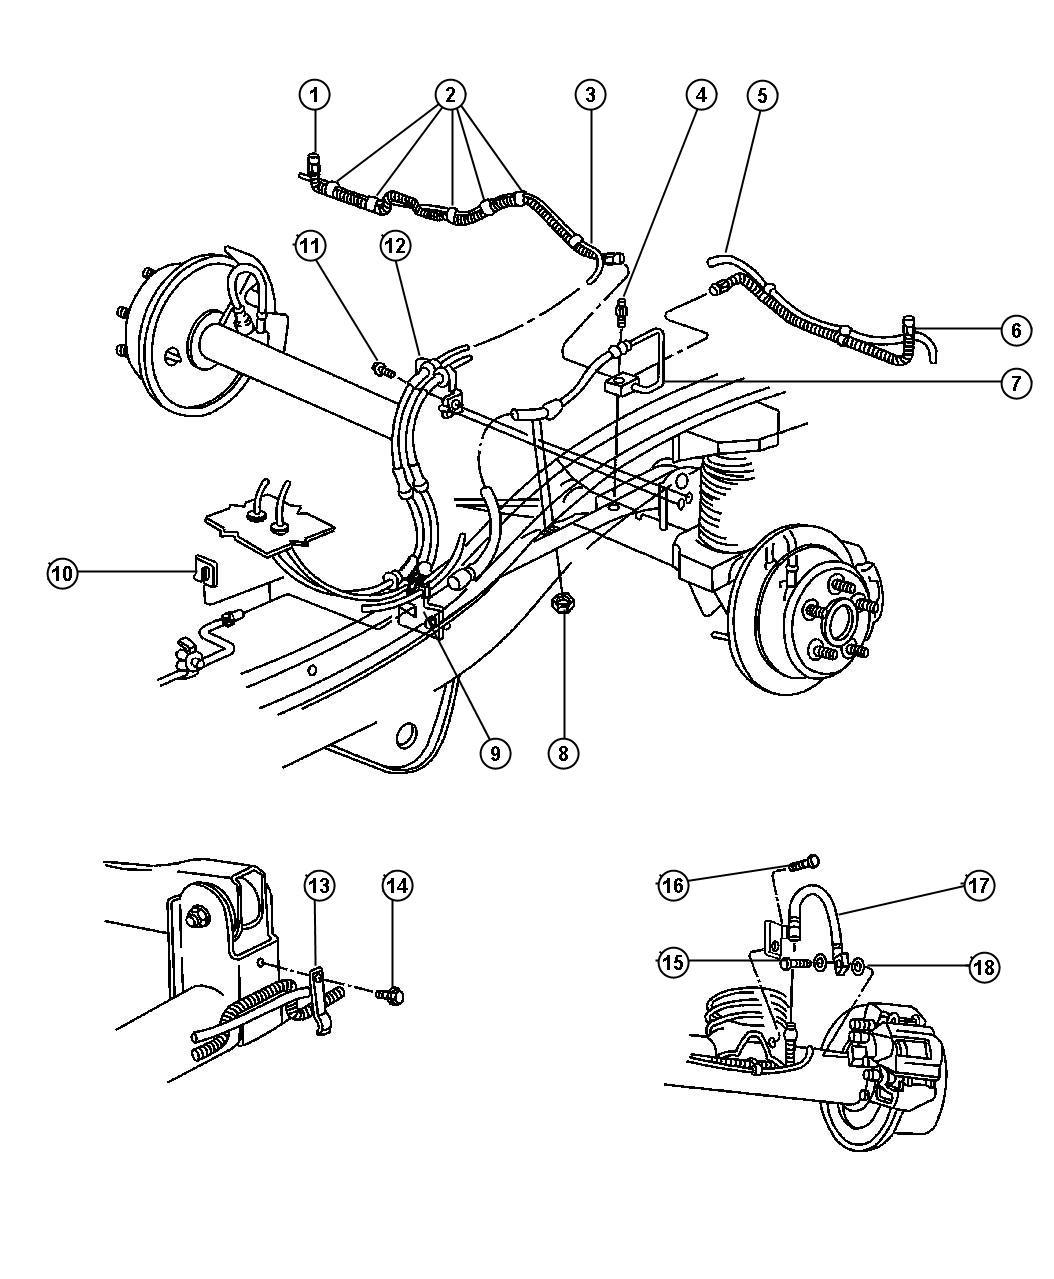 Oldsmobile Bravada Wiring Diagram